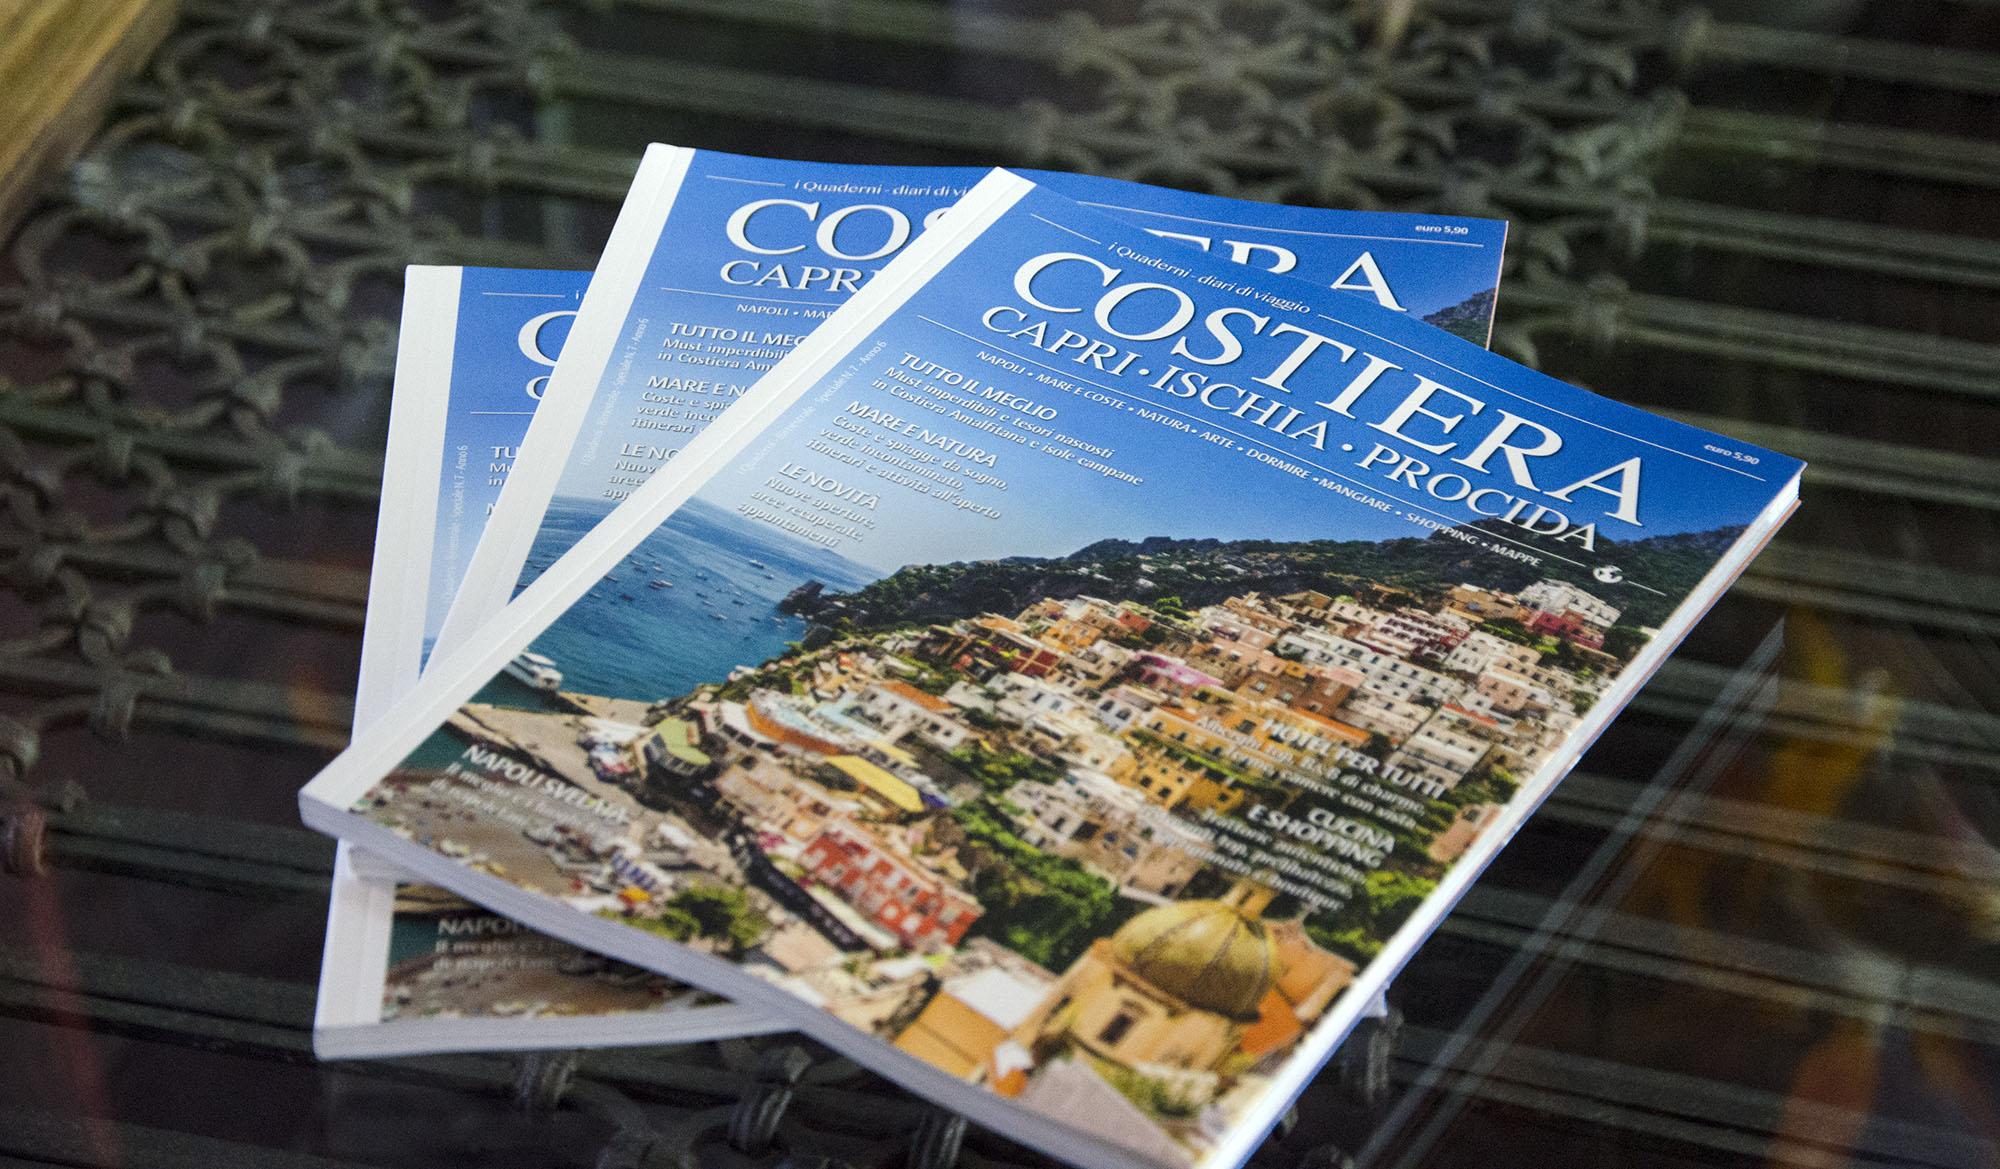 guida turistica costiera, capri, ischia, procida